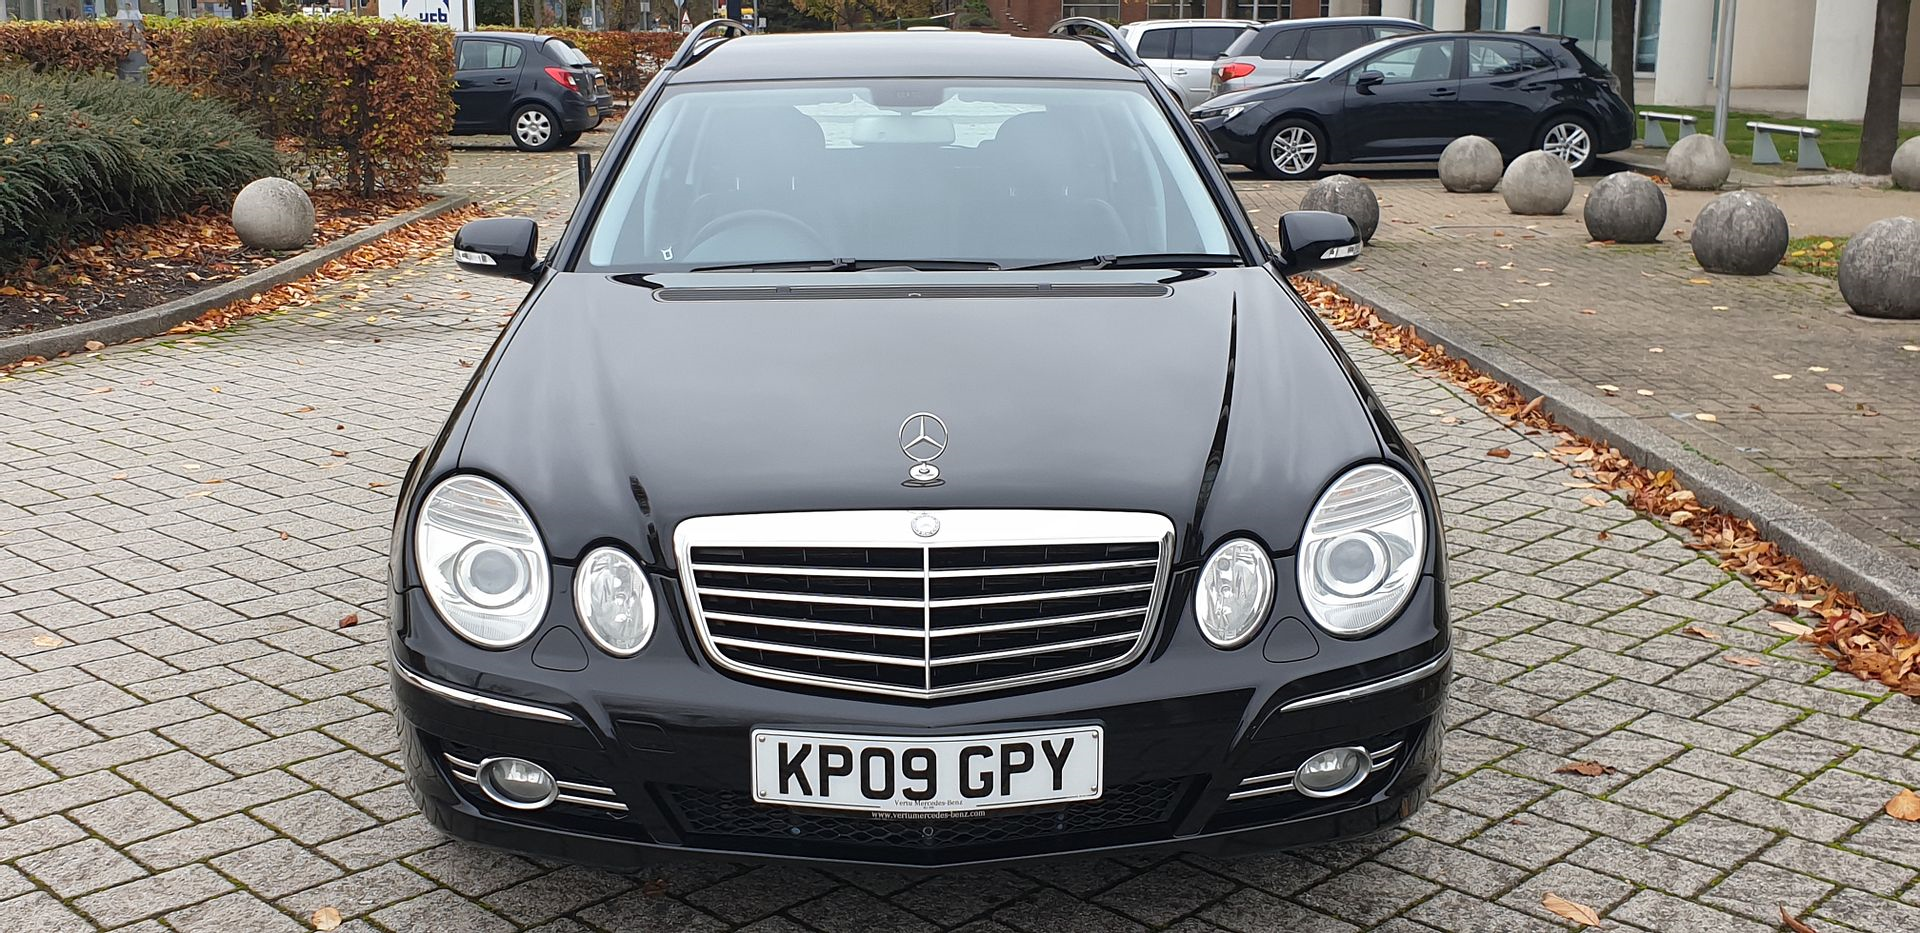 2009 Mercedes e220 cdi avantgarde estate 1 prev owner For Sale (picture 2 of 6)